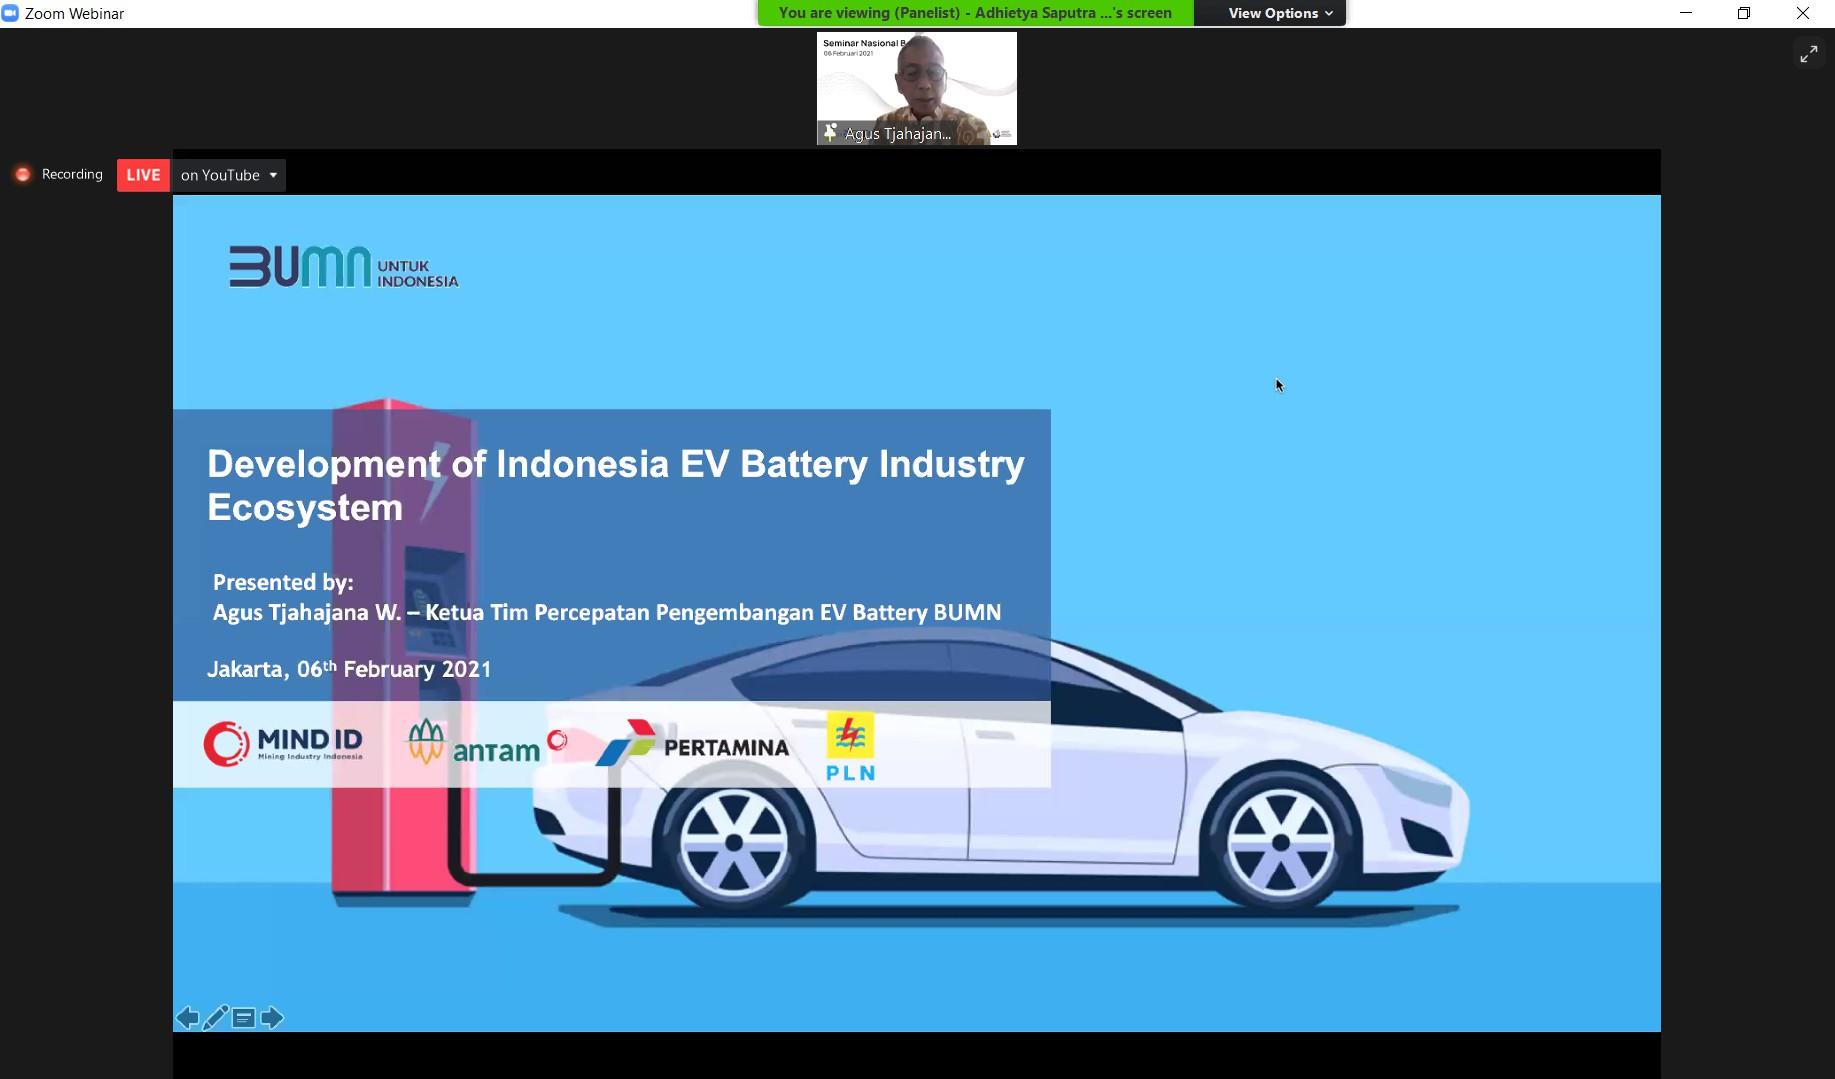 Pemaparan Ir. Agus Tjahajana tentang pengembangan ekosistem industri baterai untuk sistem kendaraan listrik di Indonesia